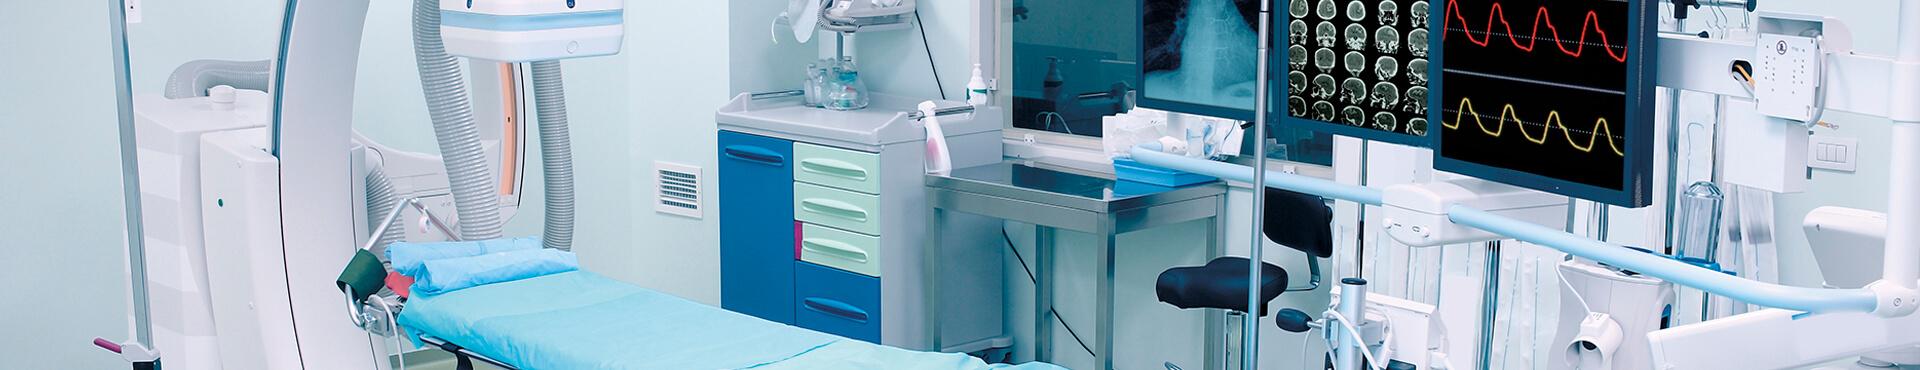 O.R. / Examination Room